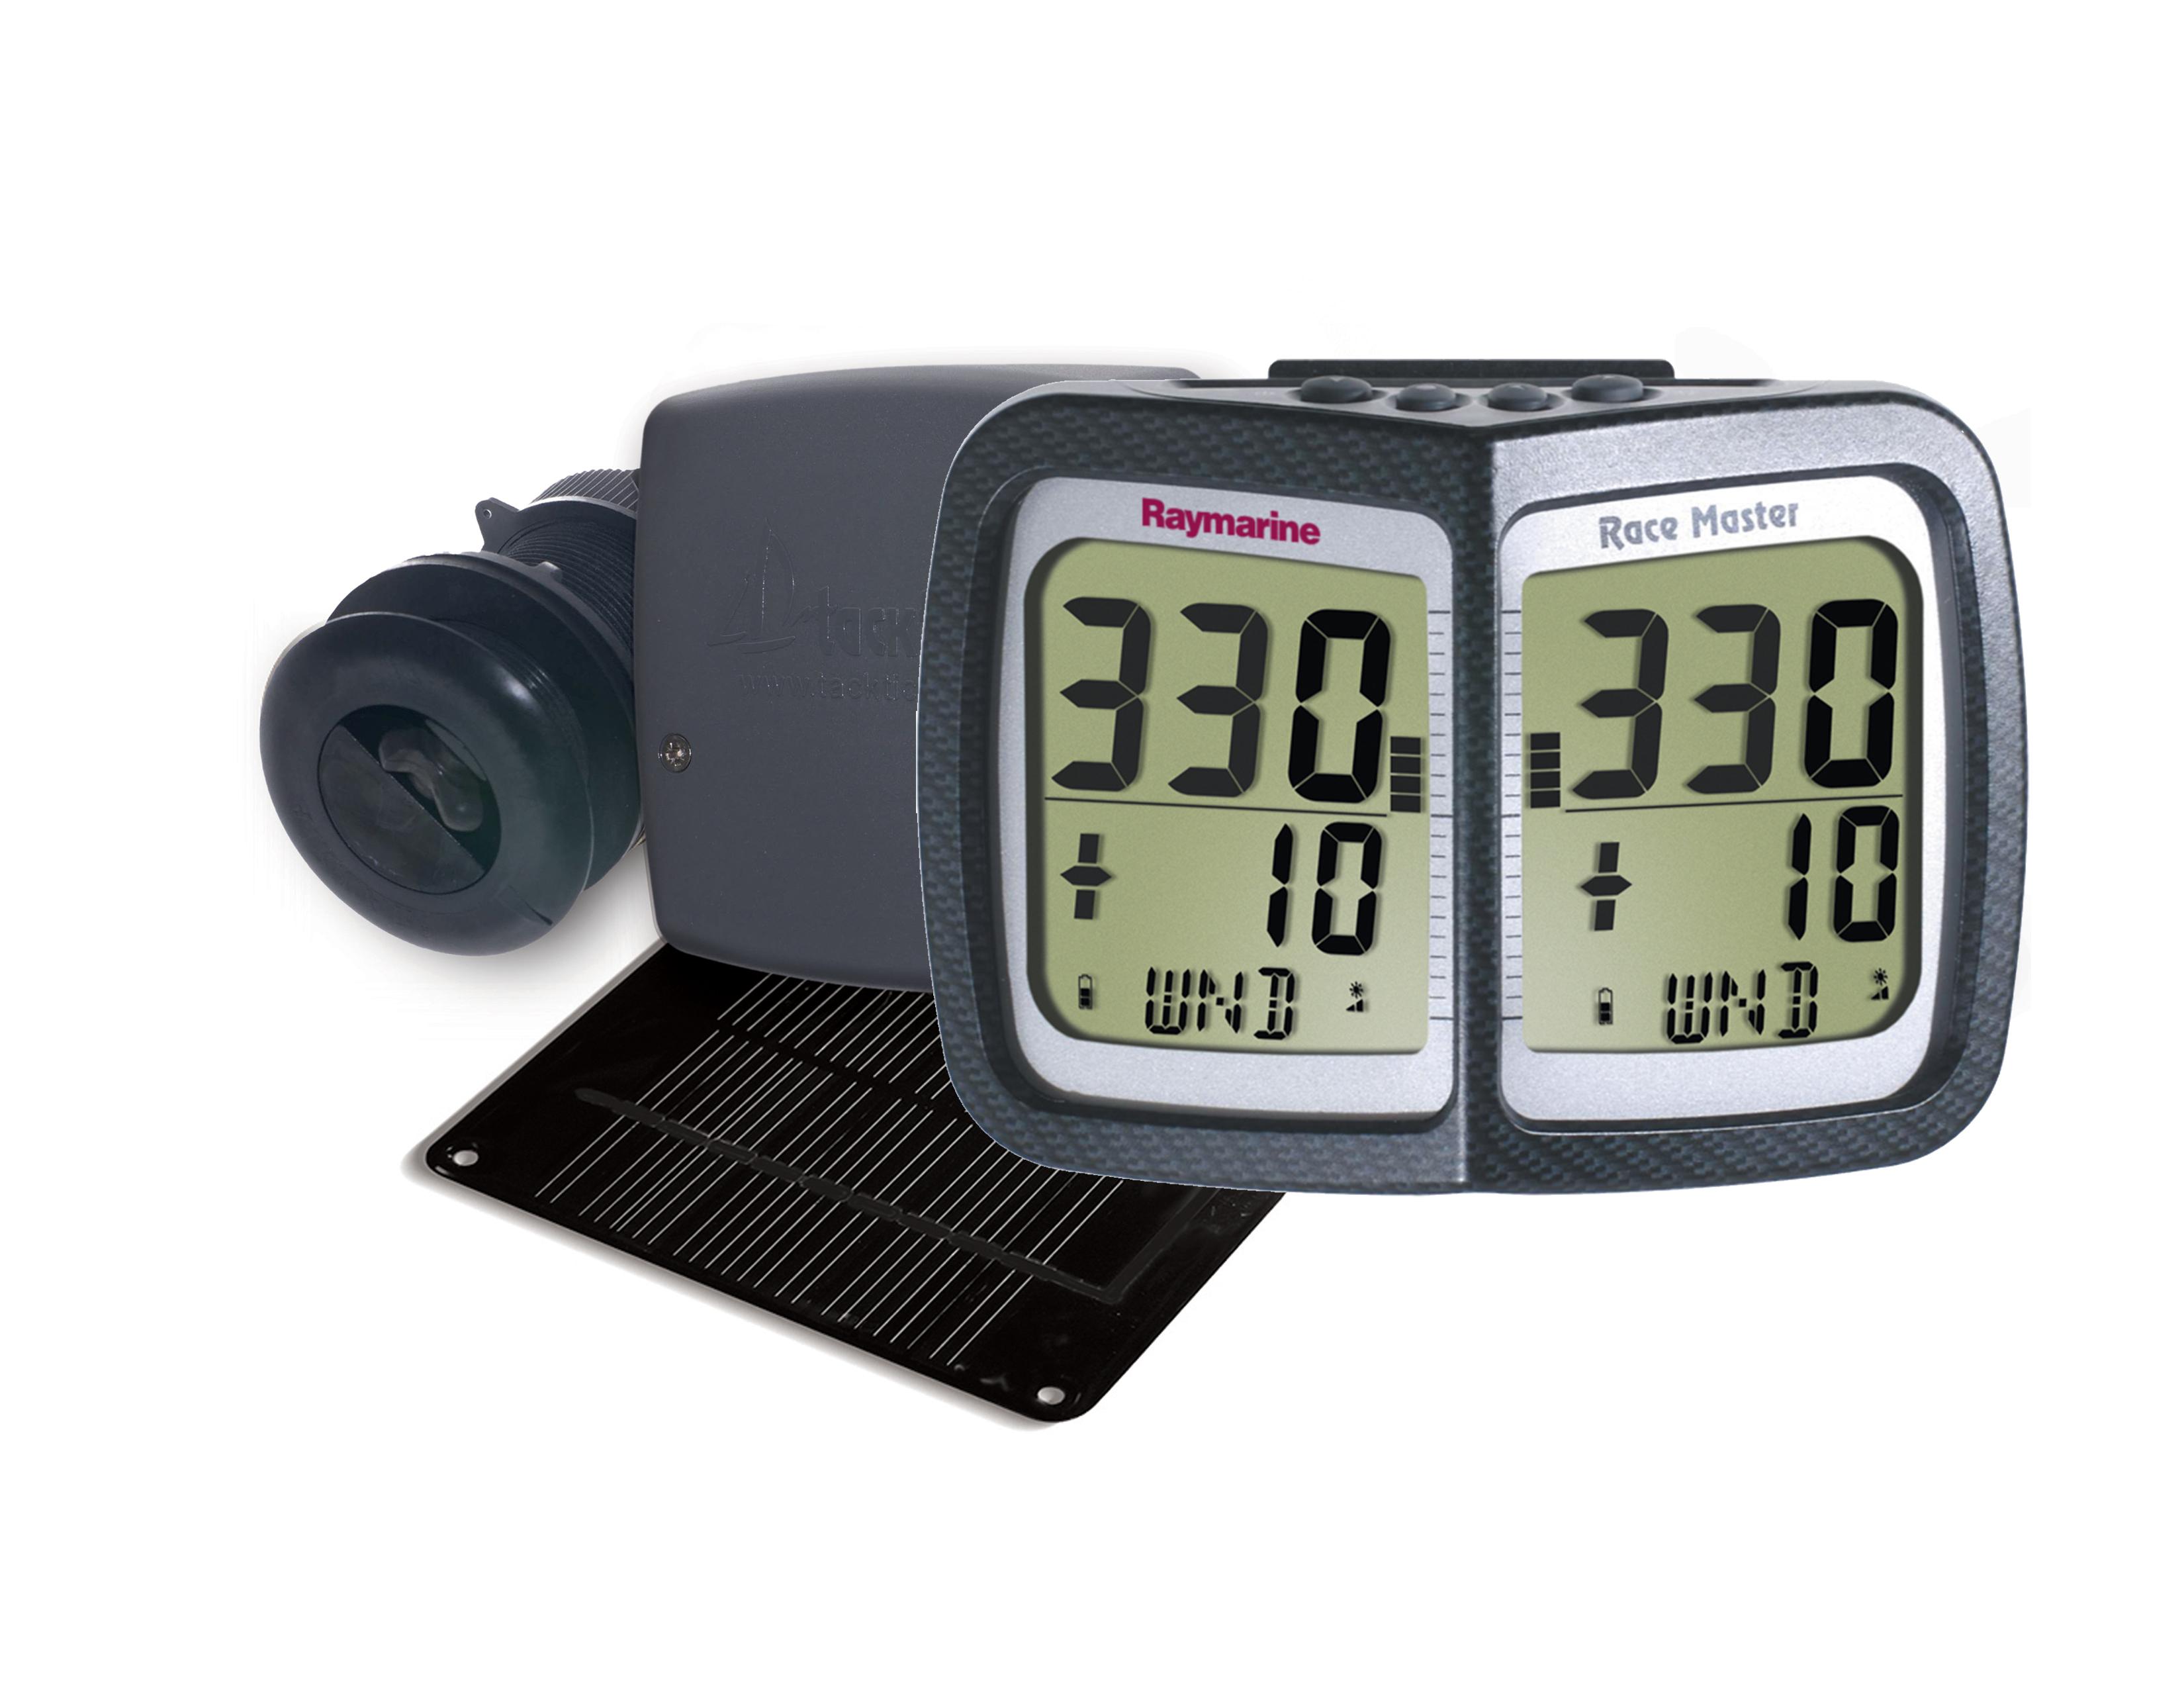 t075-916 raymarine racemaster system instrument